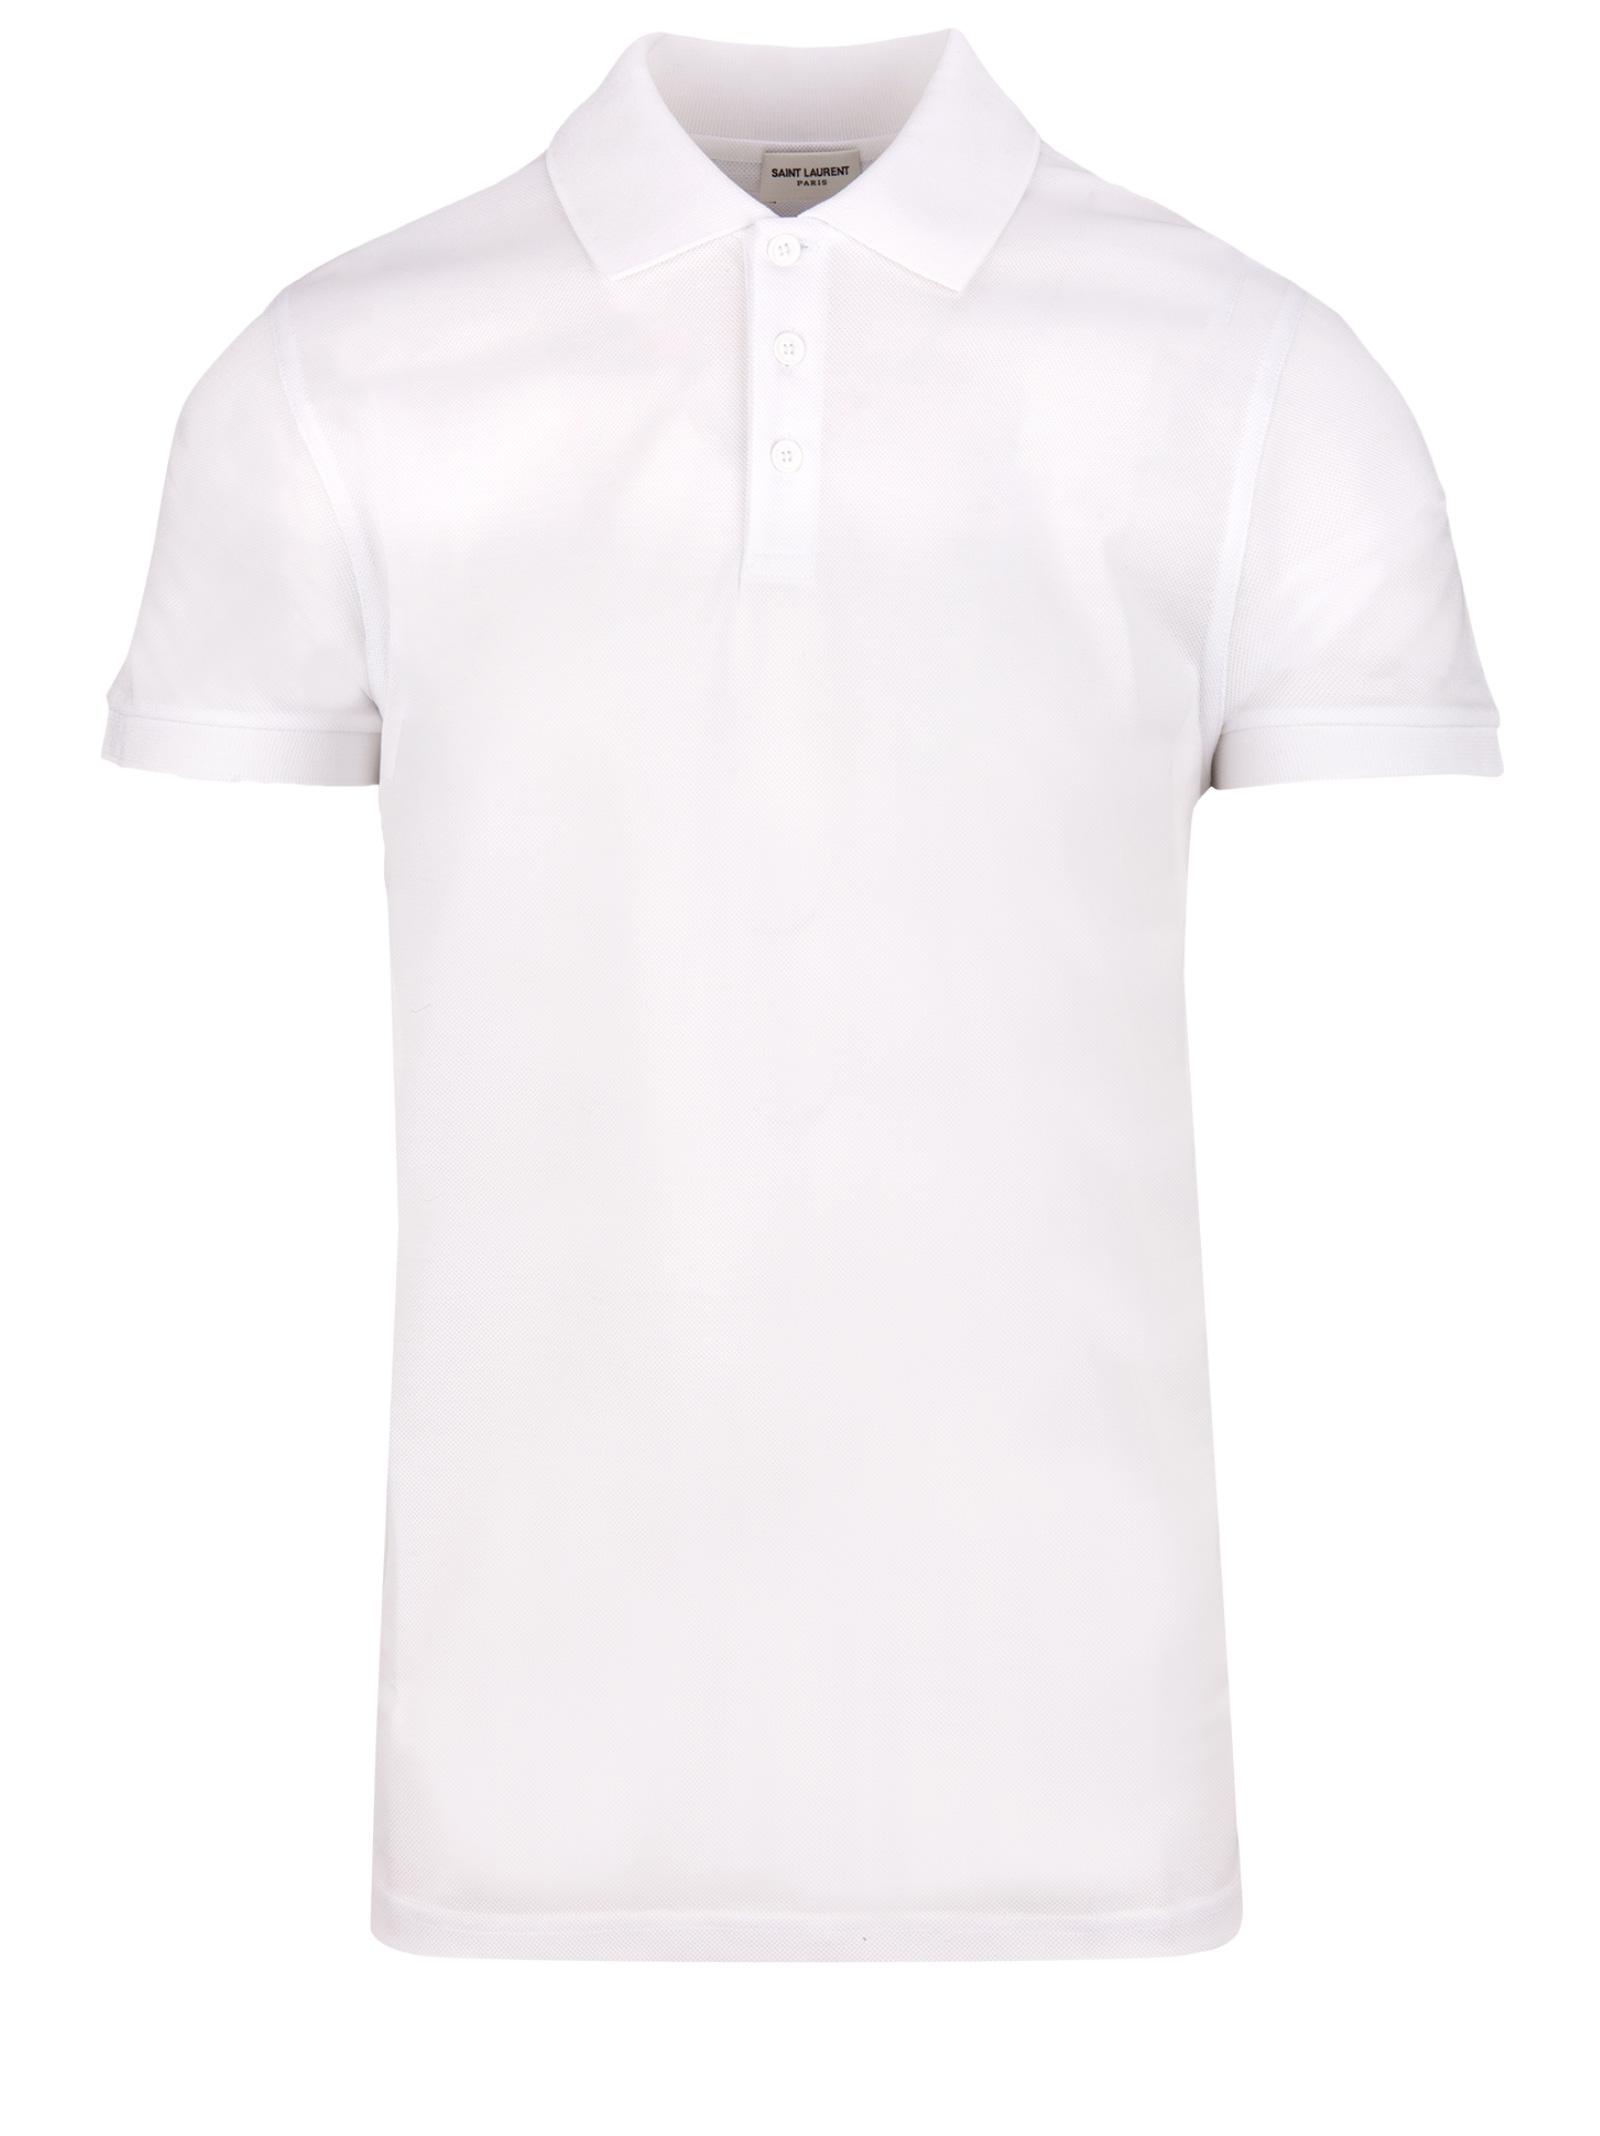 0e4b9594ca3673 Saint Laurent polo shirt - Saint Laurent - Michele Franzese Moda